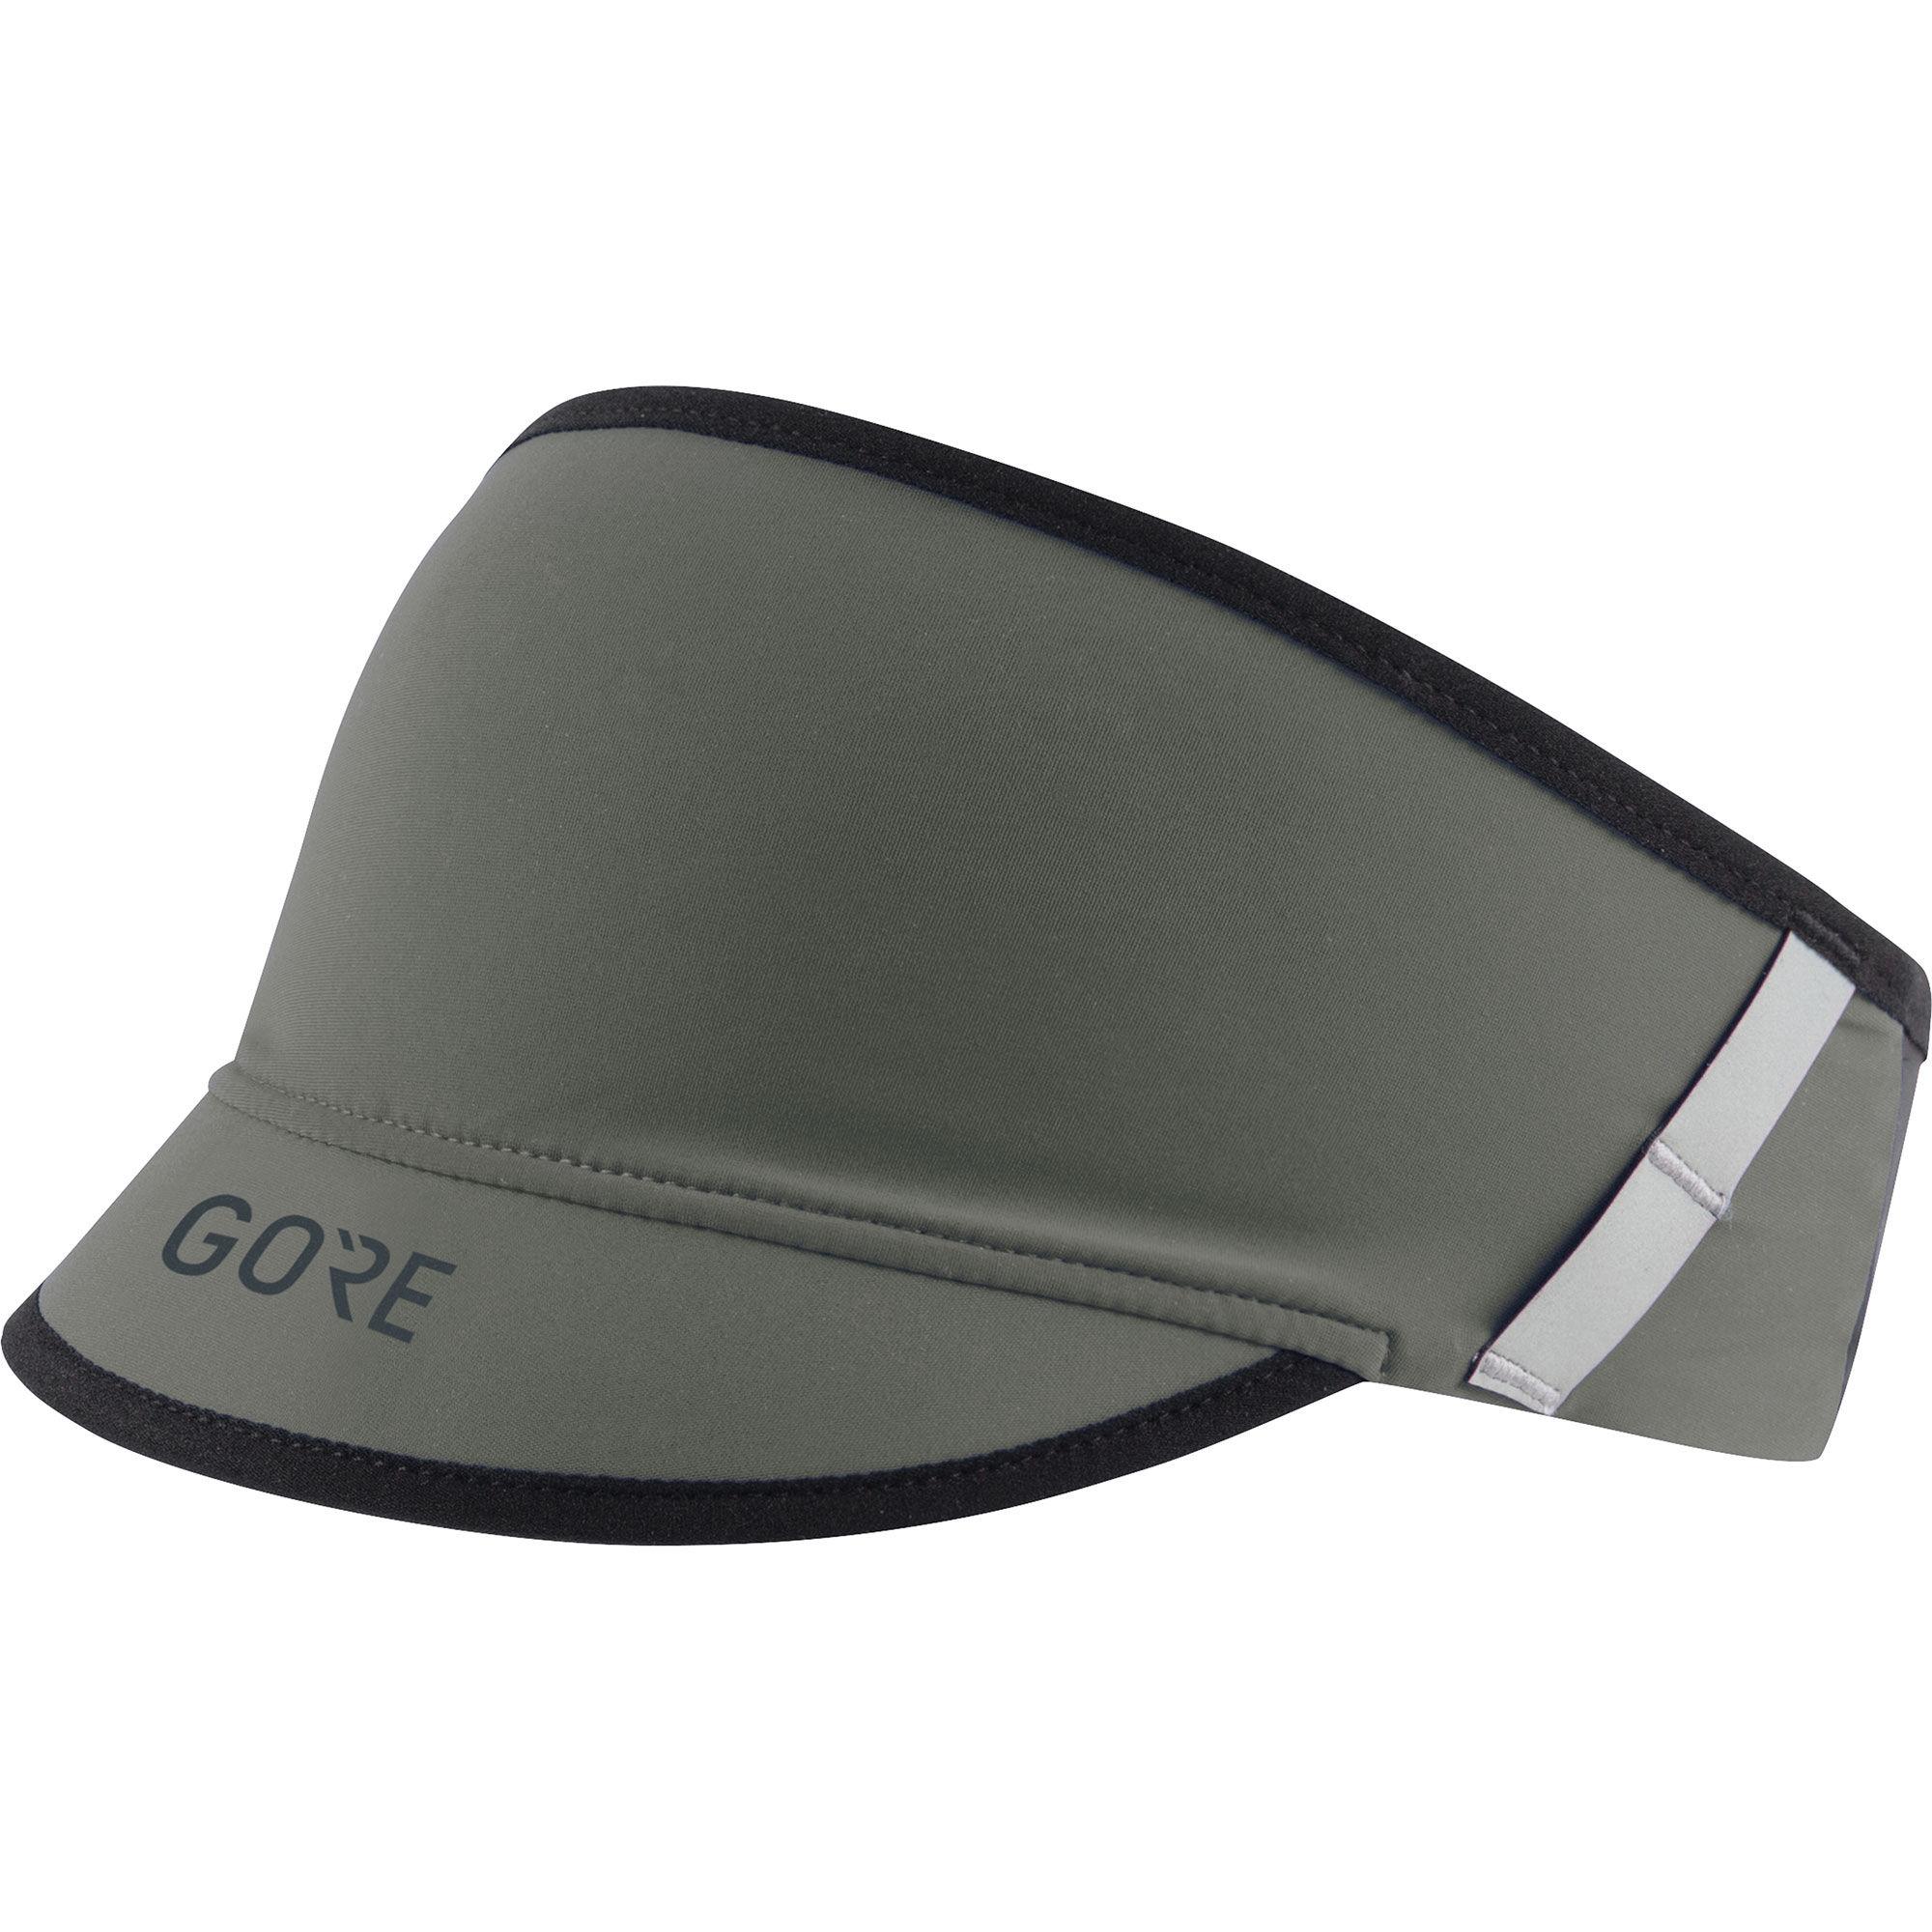 Gore R7 Visor in Grau